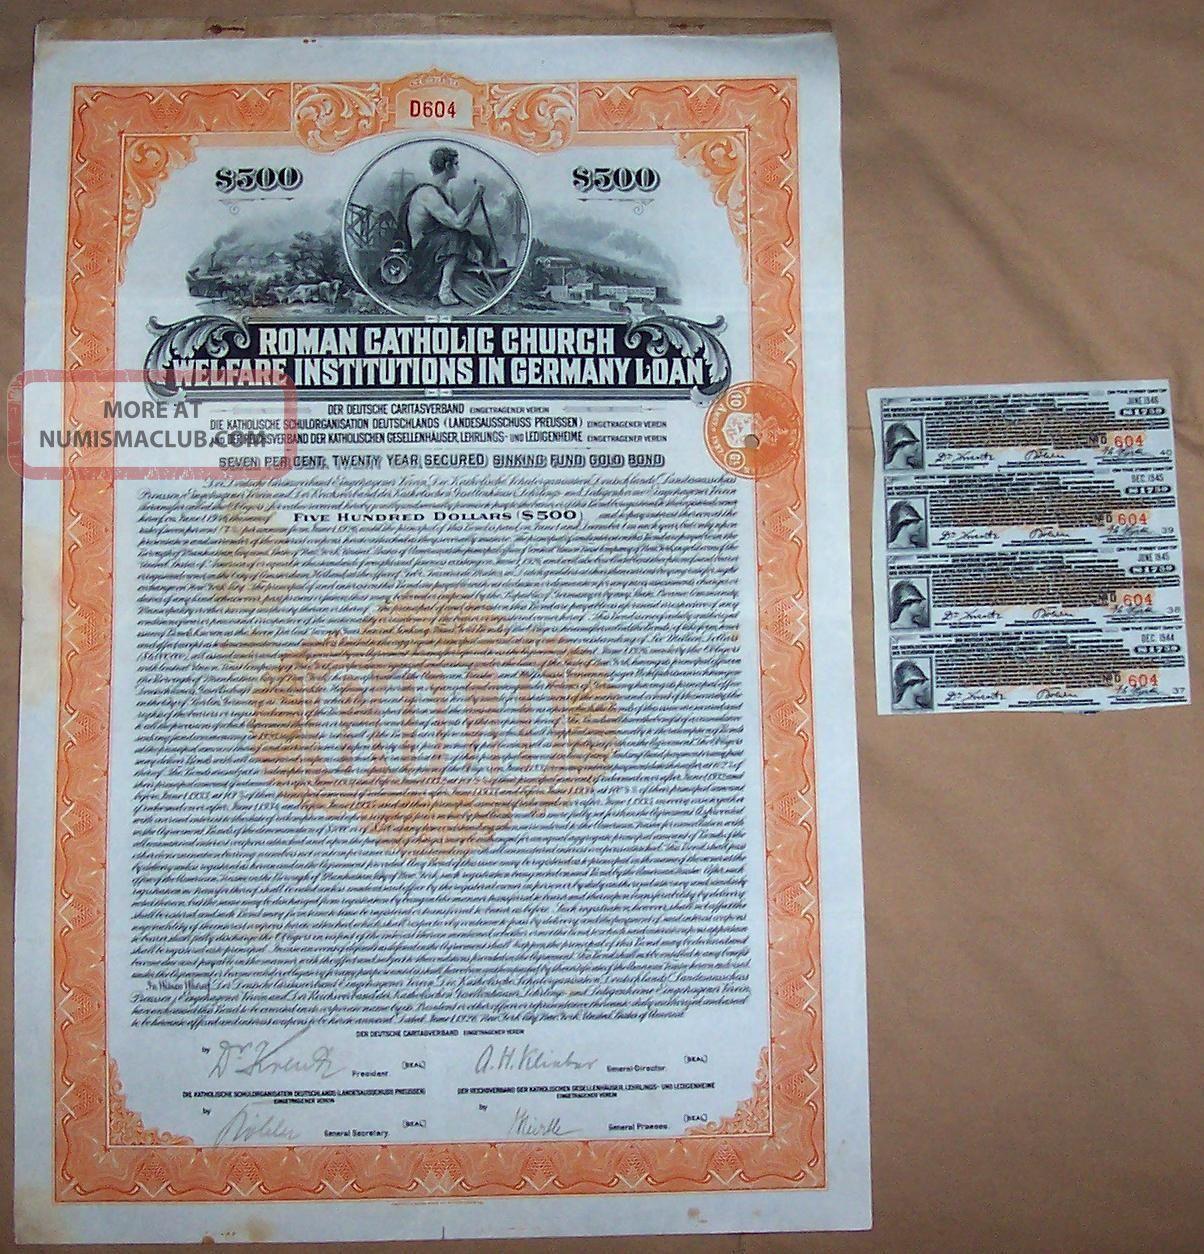 Roman Catholic Church Germany 7% Sinking Fund Gold Bond 1926 $500 Coup Scarce World photo